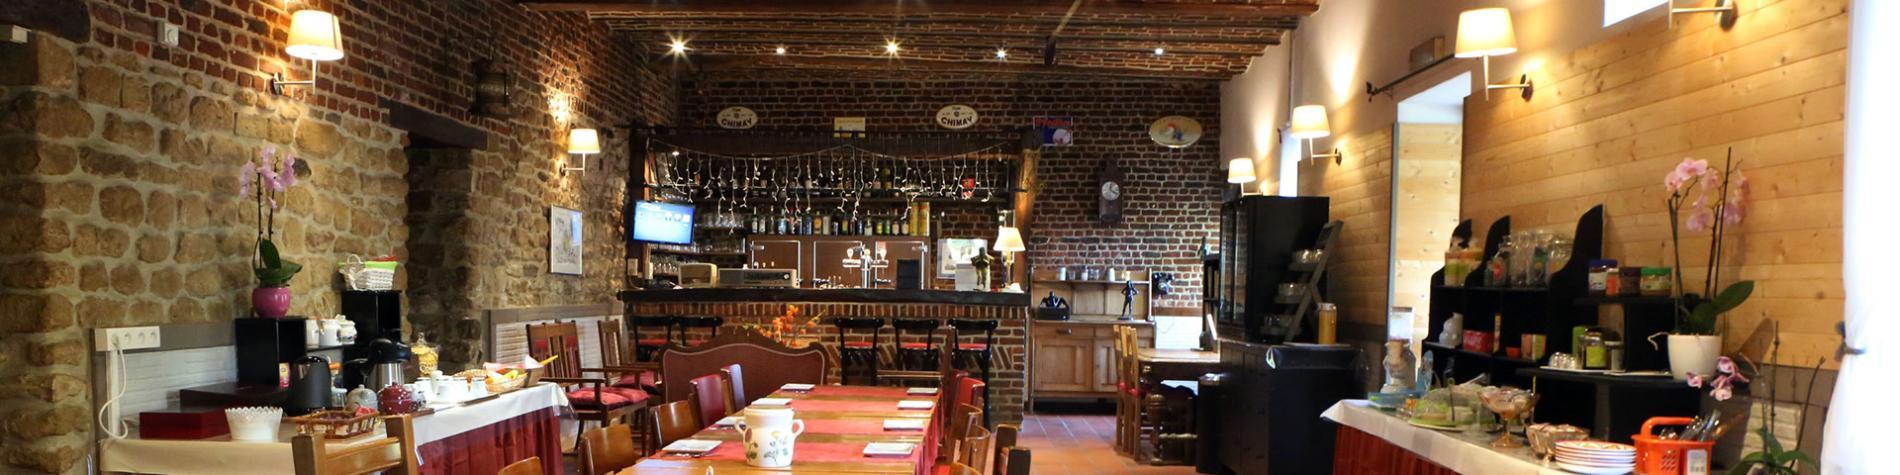 Ferme - Grambais - Hôtel - Nivelles - petit déjuner